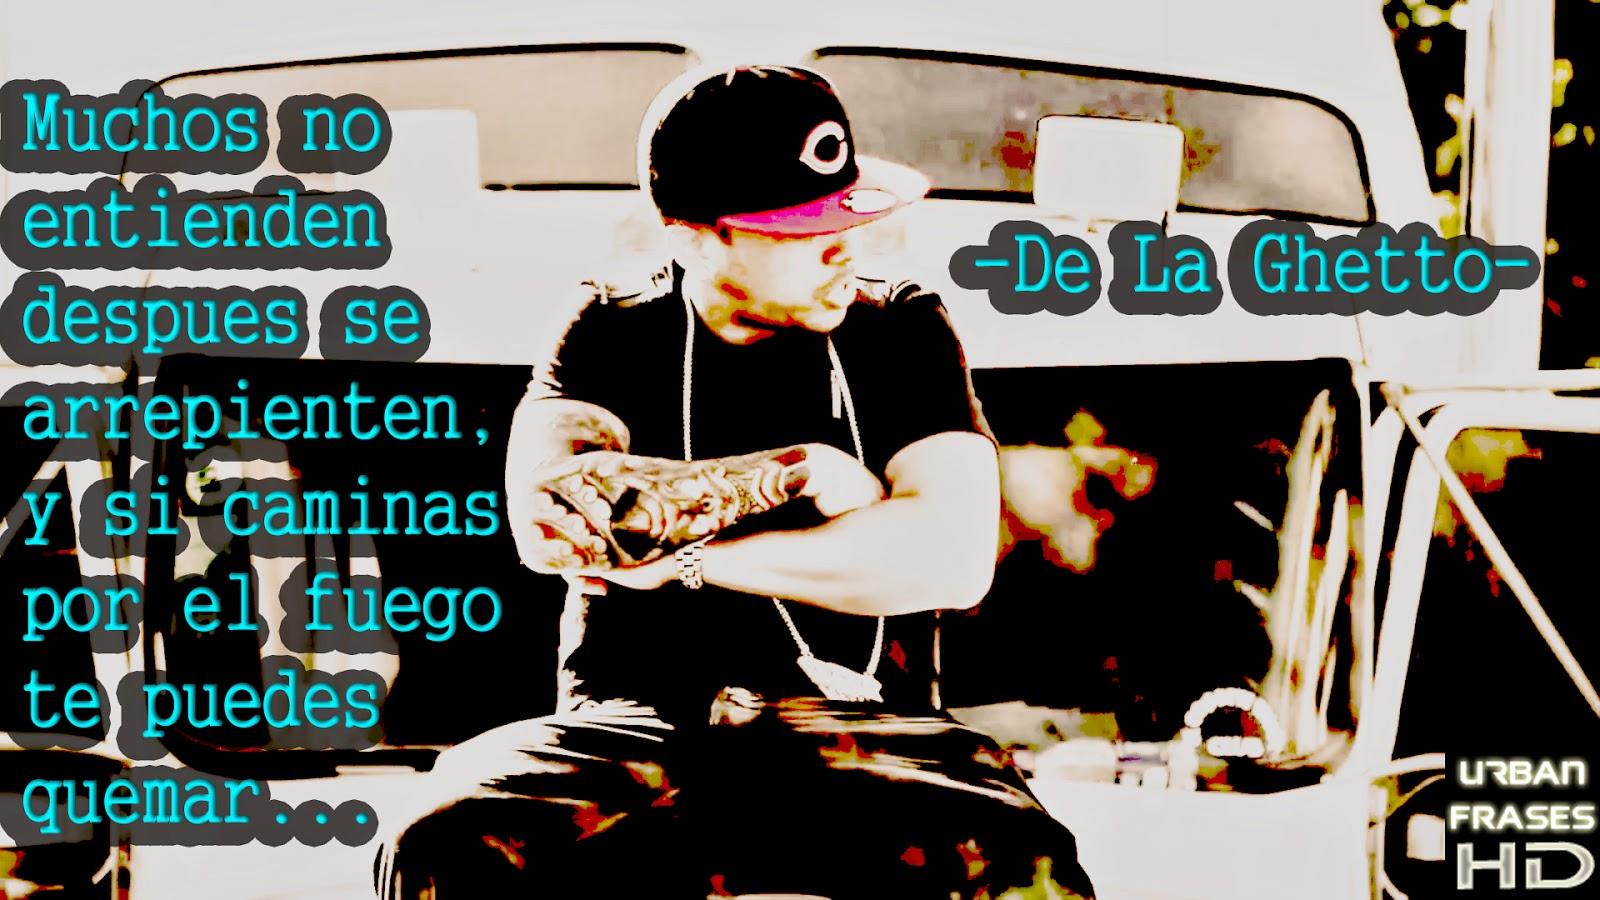 Urban Frases Hd Jala Gatillo De La Ghetto